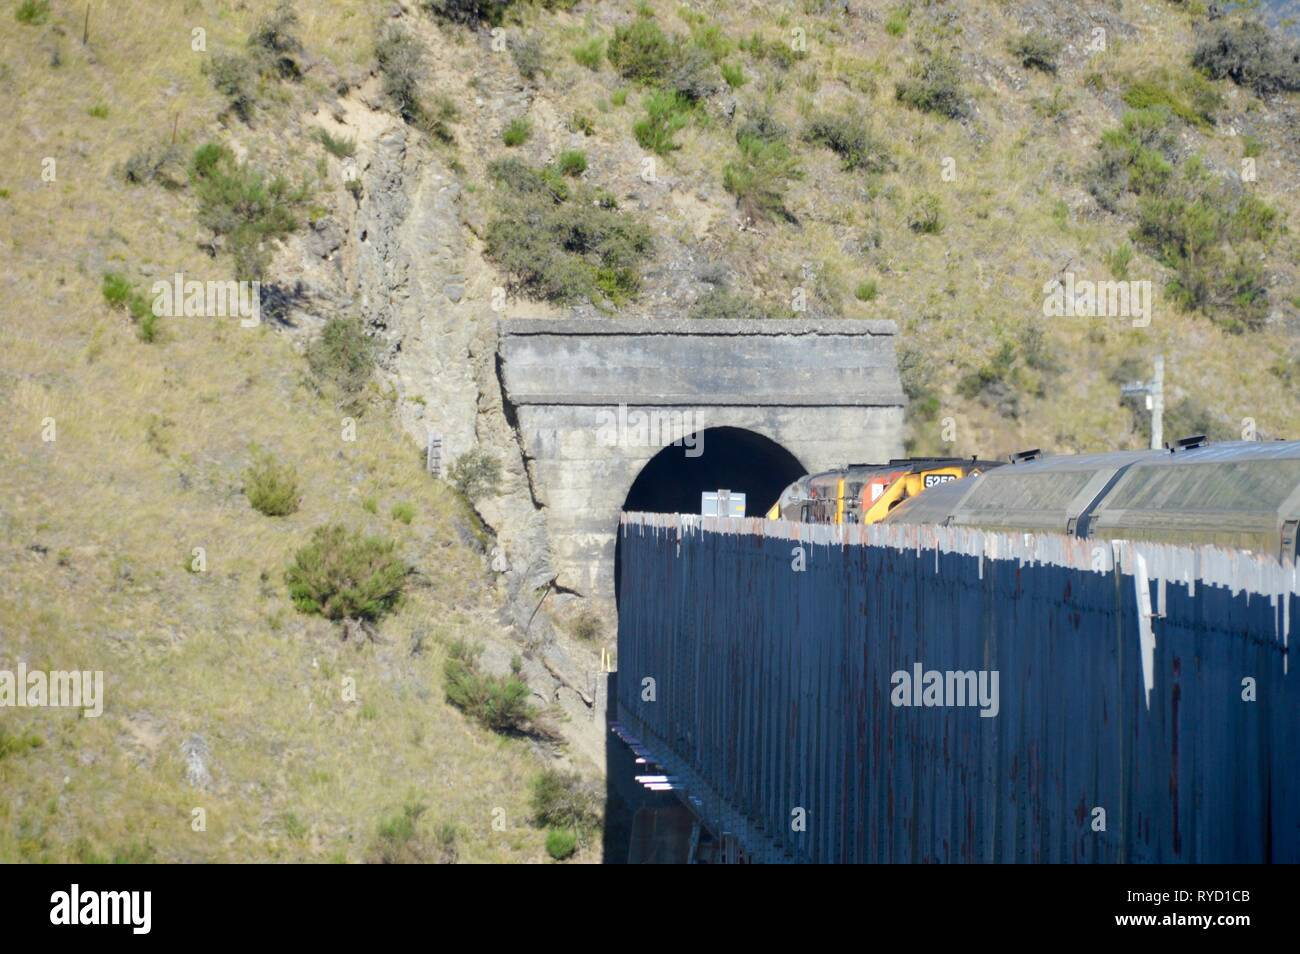 Train bridges in the New Zealand Alps - Stock Image